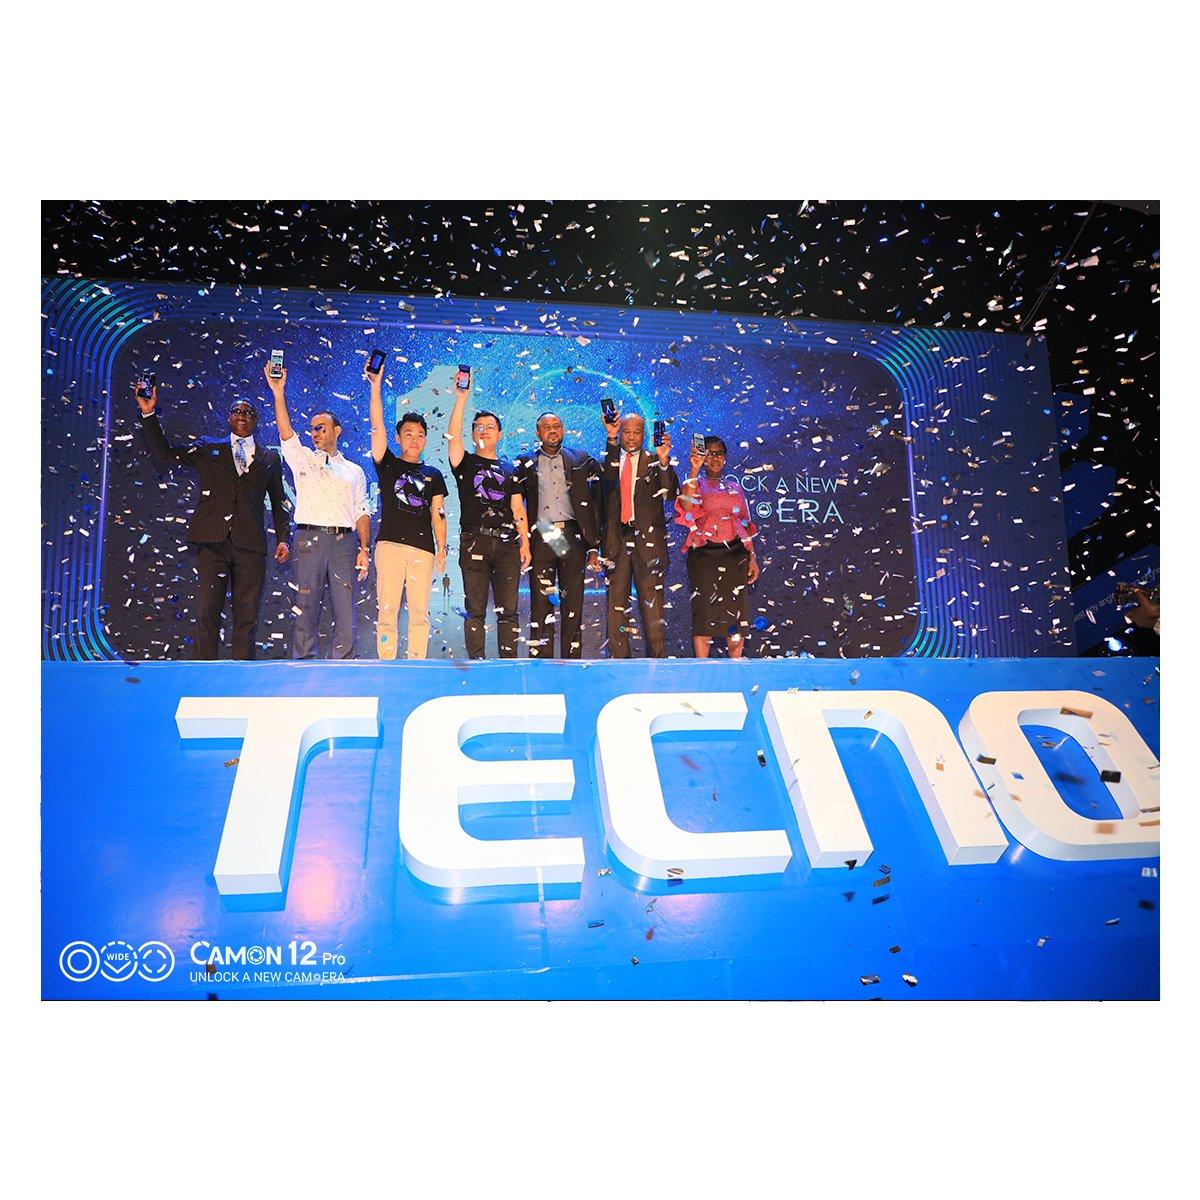 TECNO Mobile Nigeria (@TECNOMobileNG) | Twitter